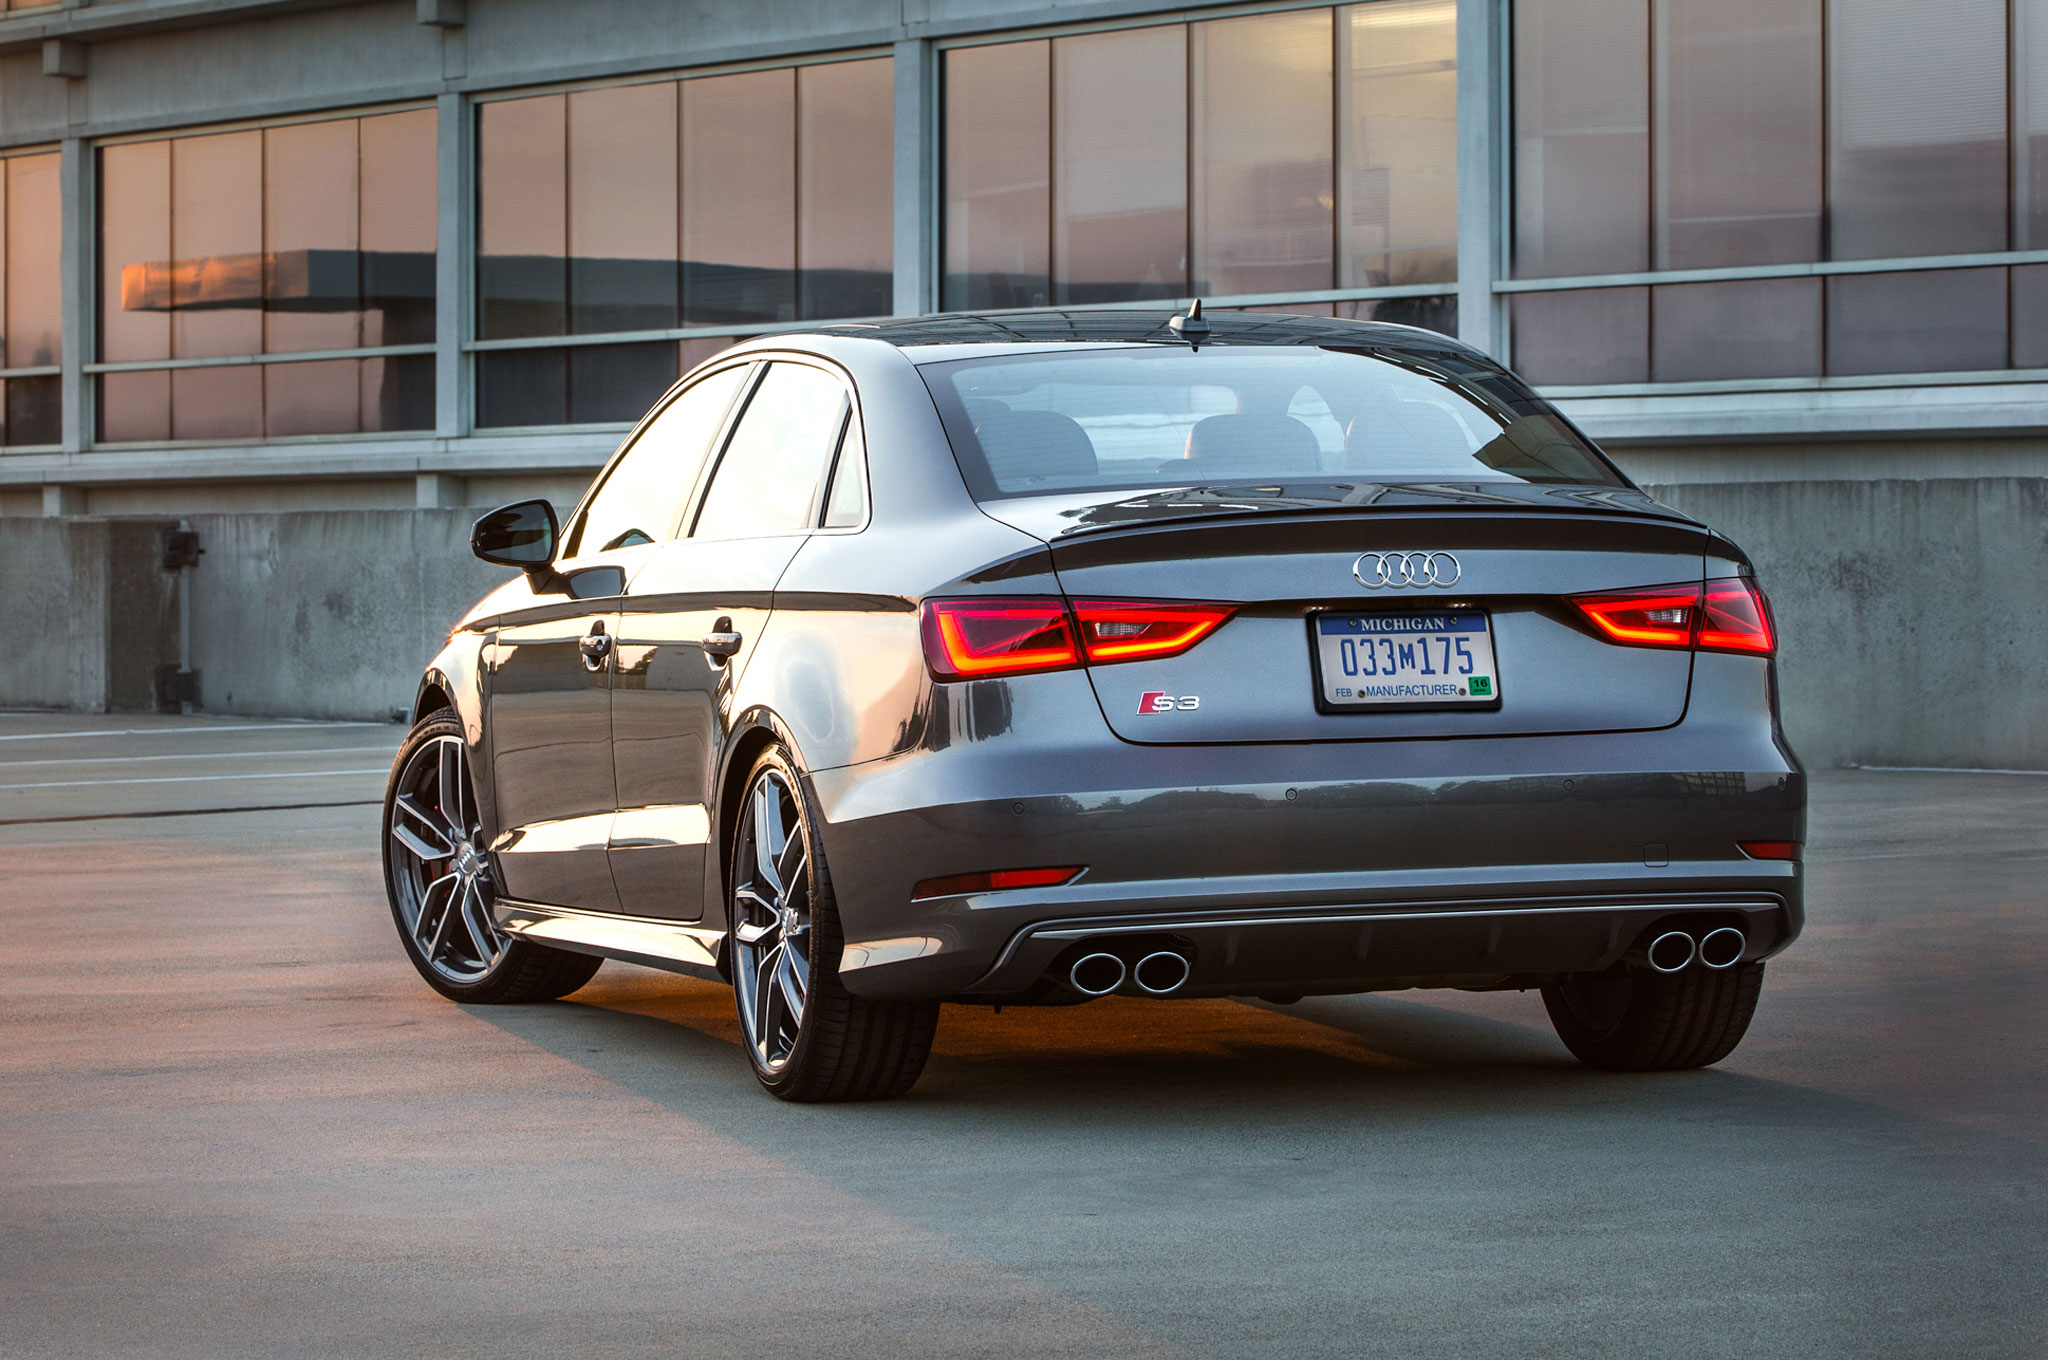 2015 Audi A3 Sedan Rear Side View Photo 35: 2015 Audi S3 Has 350-Car Limited Edition